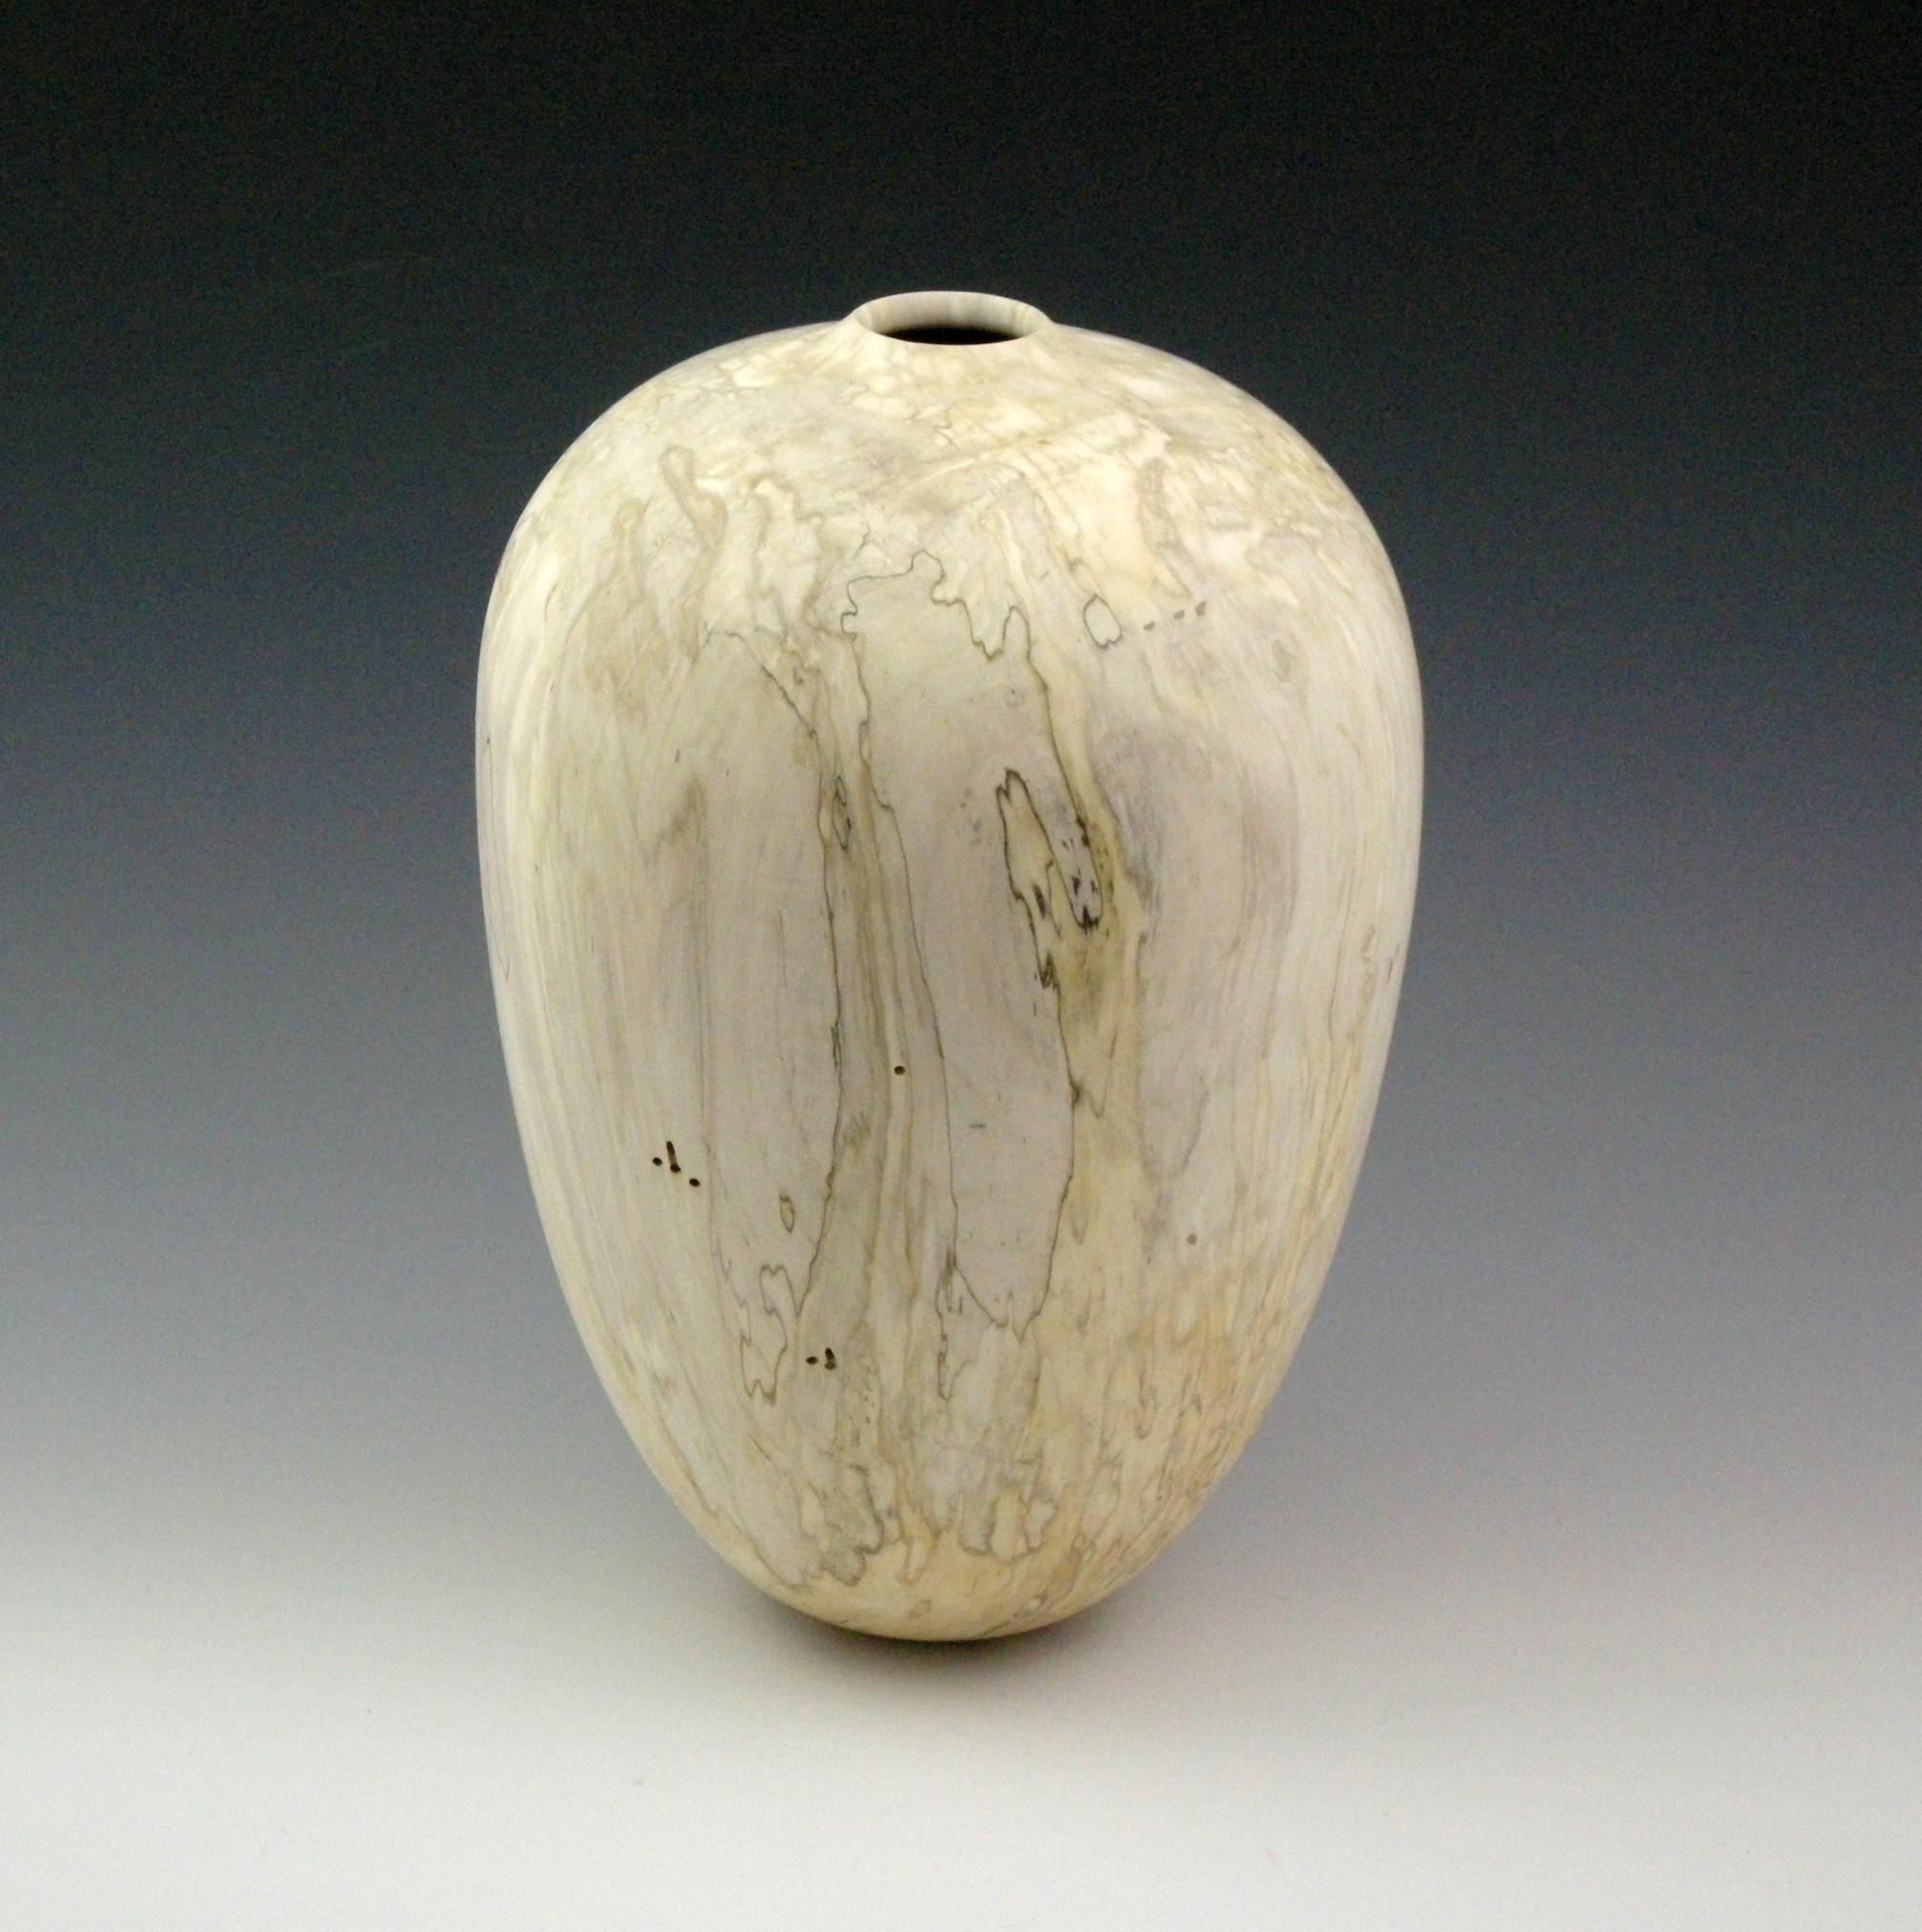 Marbleized Maple Vessel #2